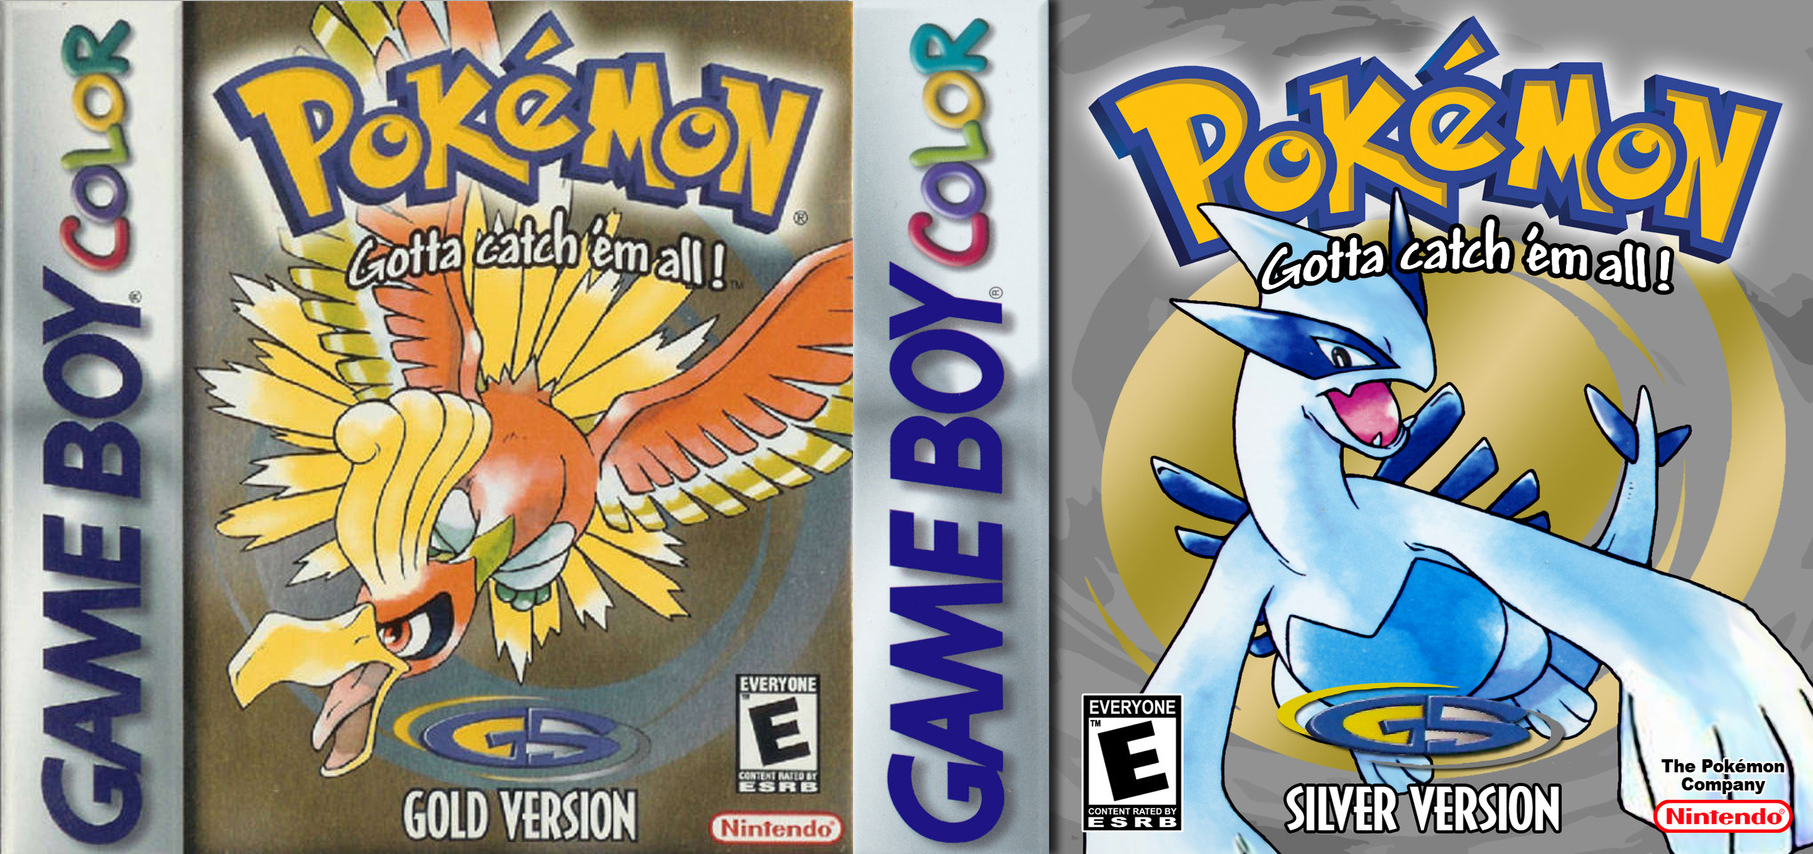 Ranking six generations of pok mon games from worst to - Pokemon argent pokemon rare ...